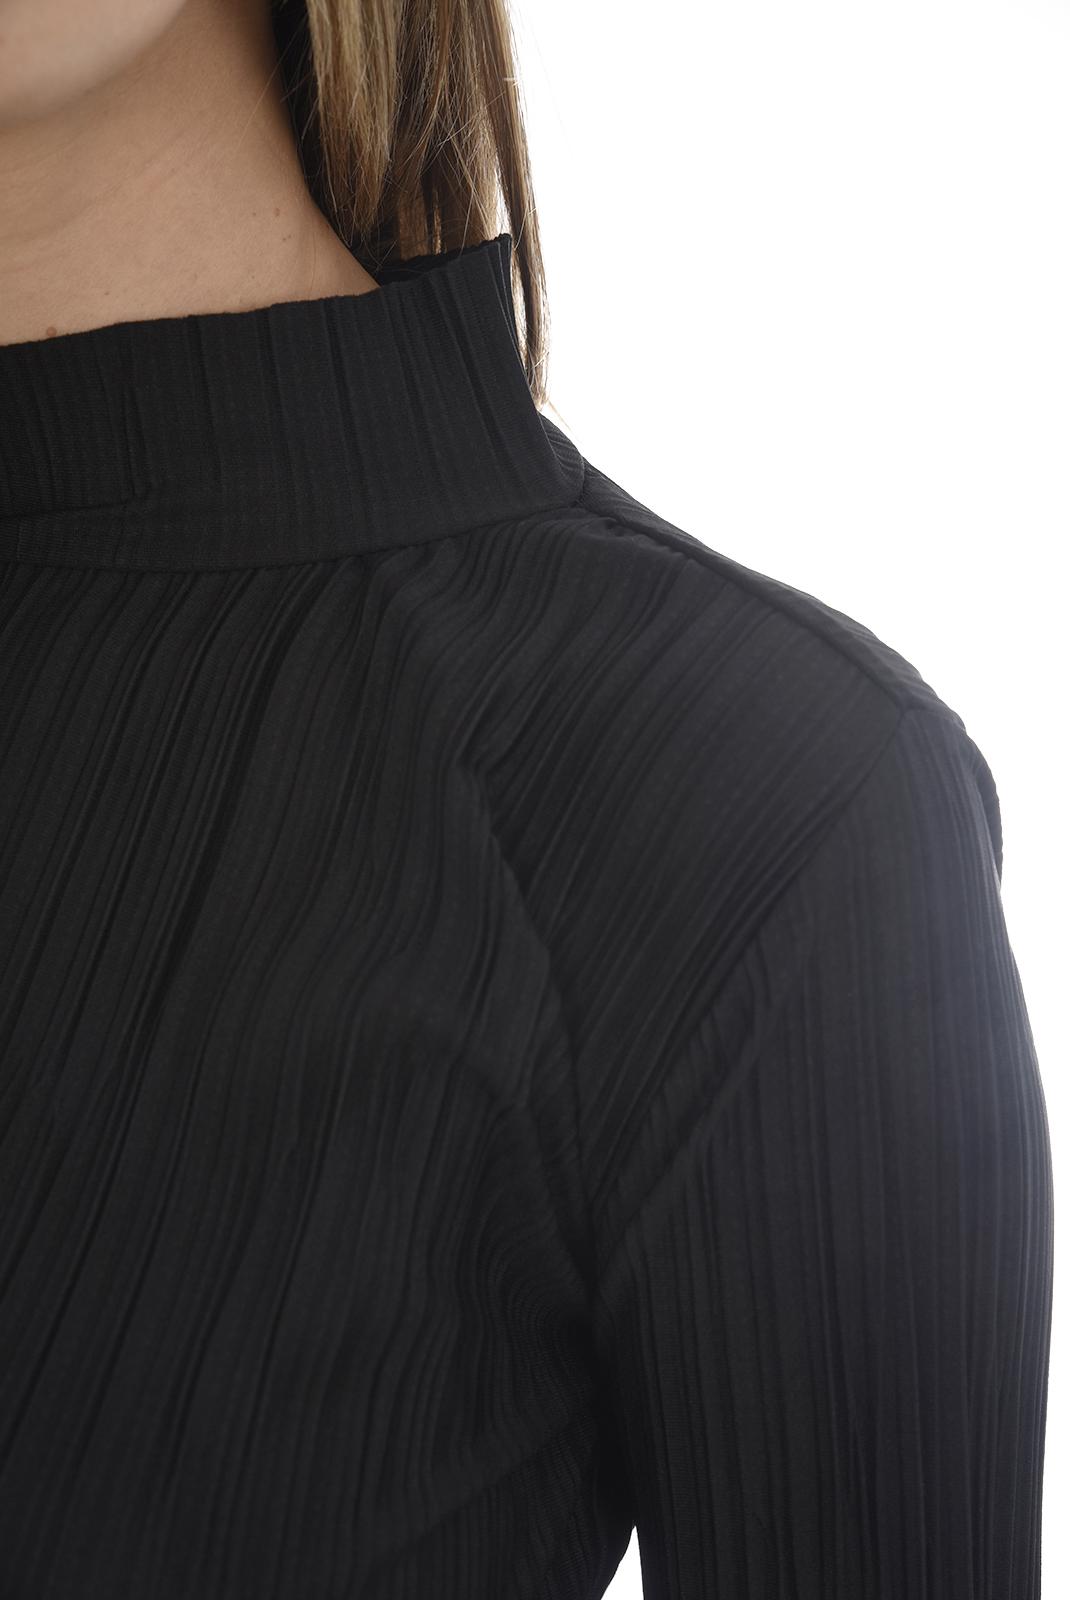 Top   Vero moda PLIS HIGH NECK L/S TOP SB2 BLACK